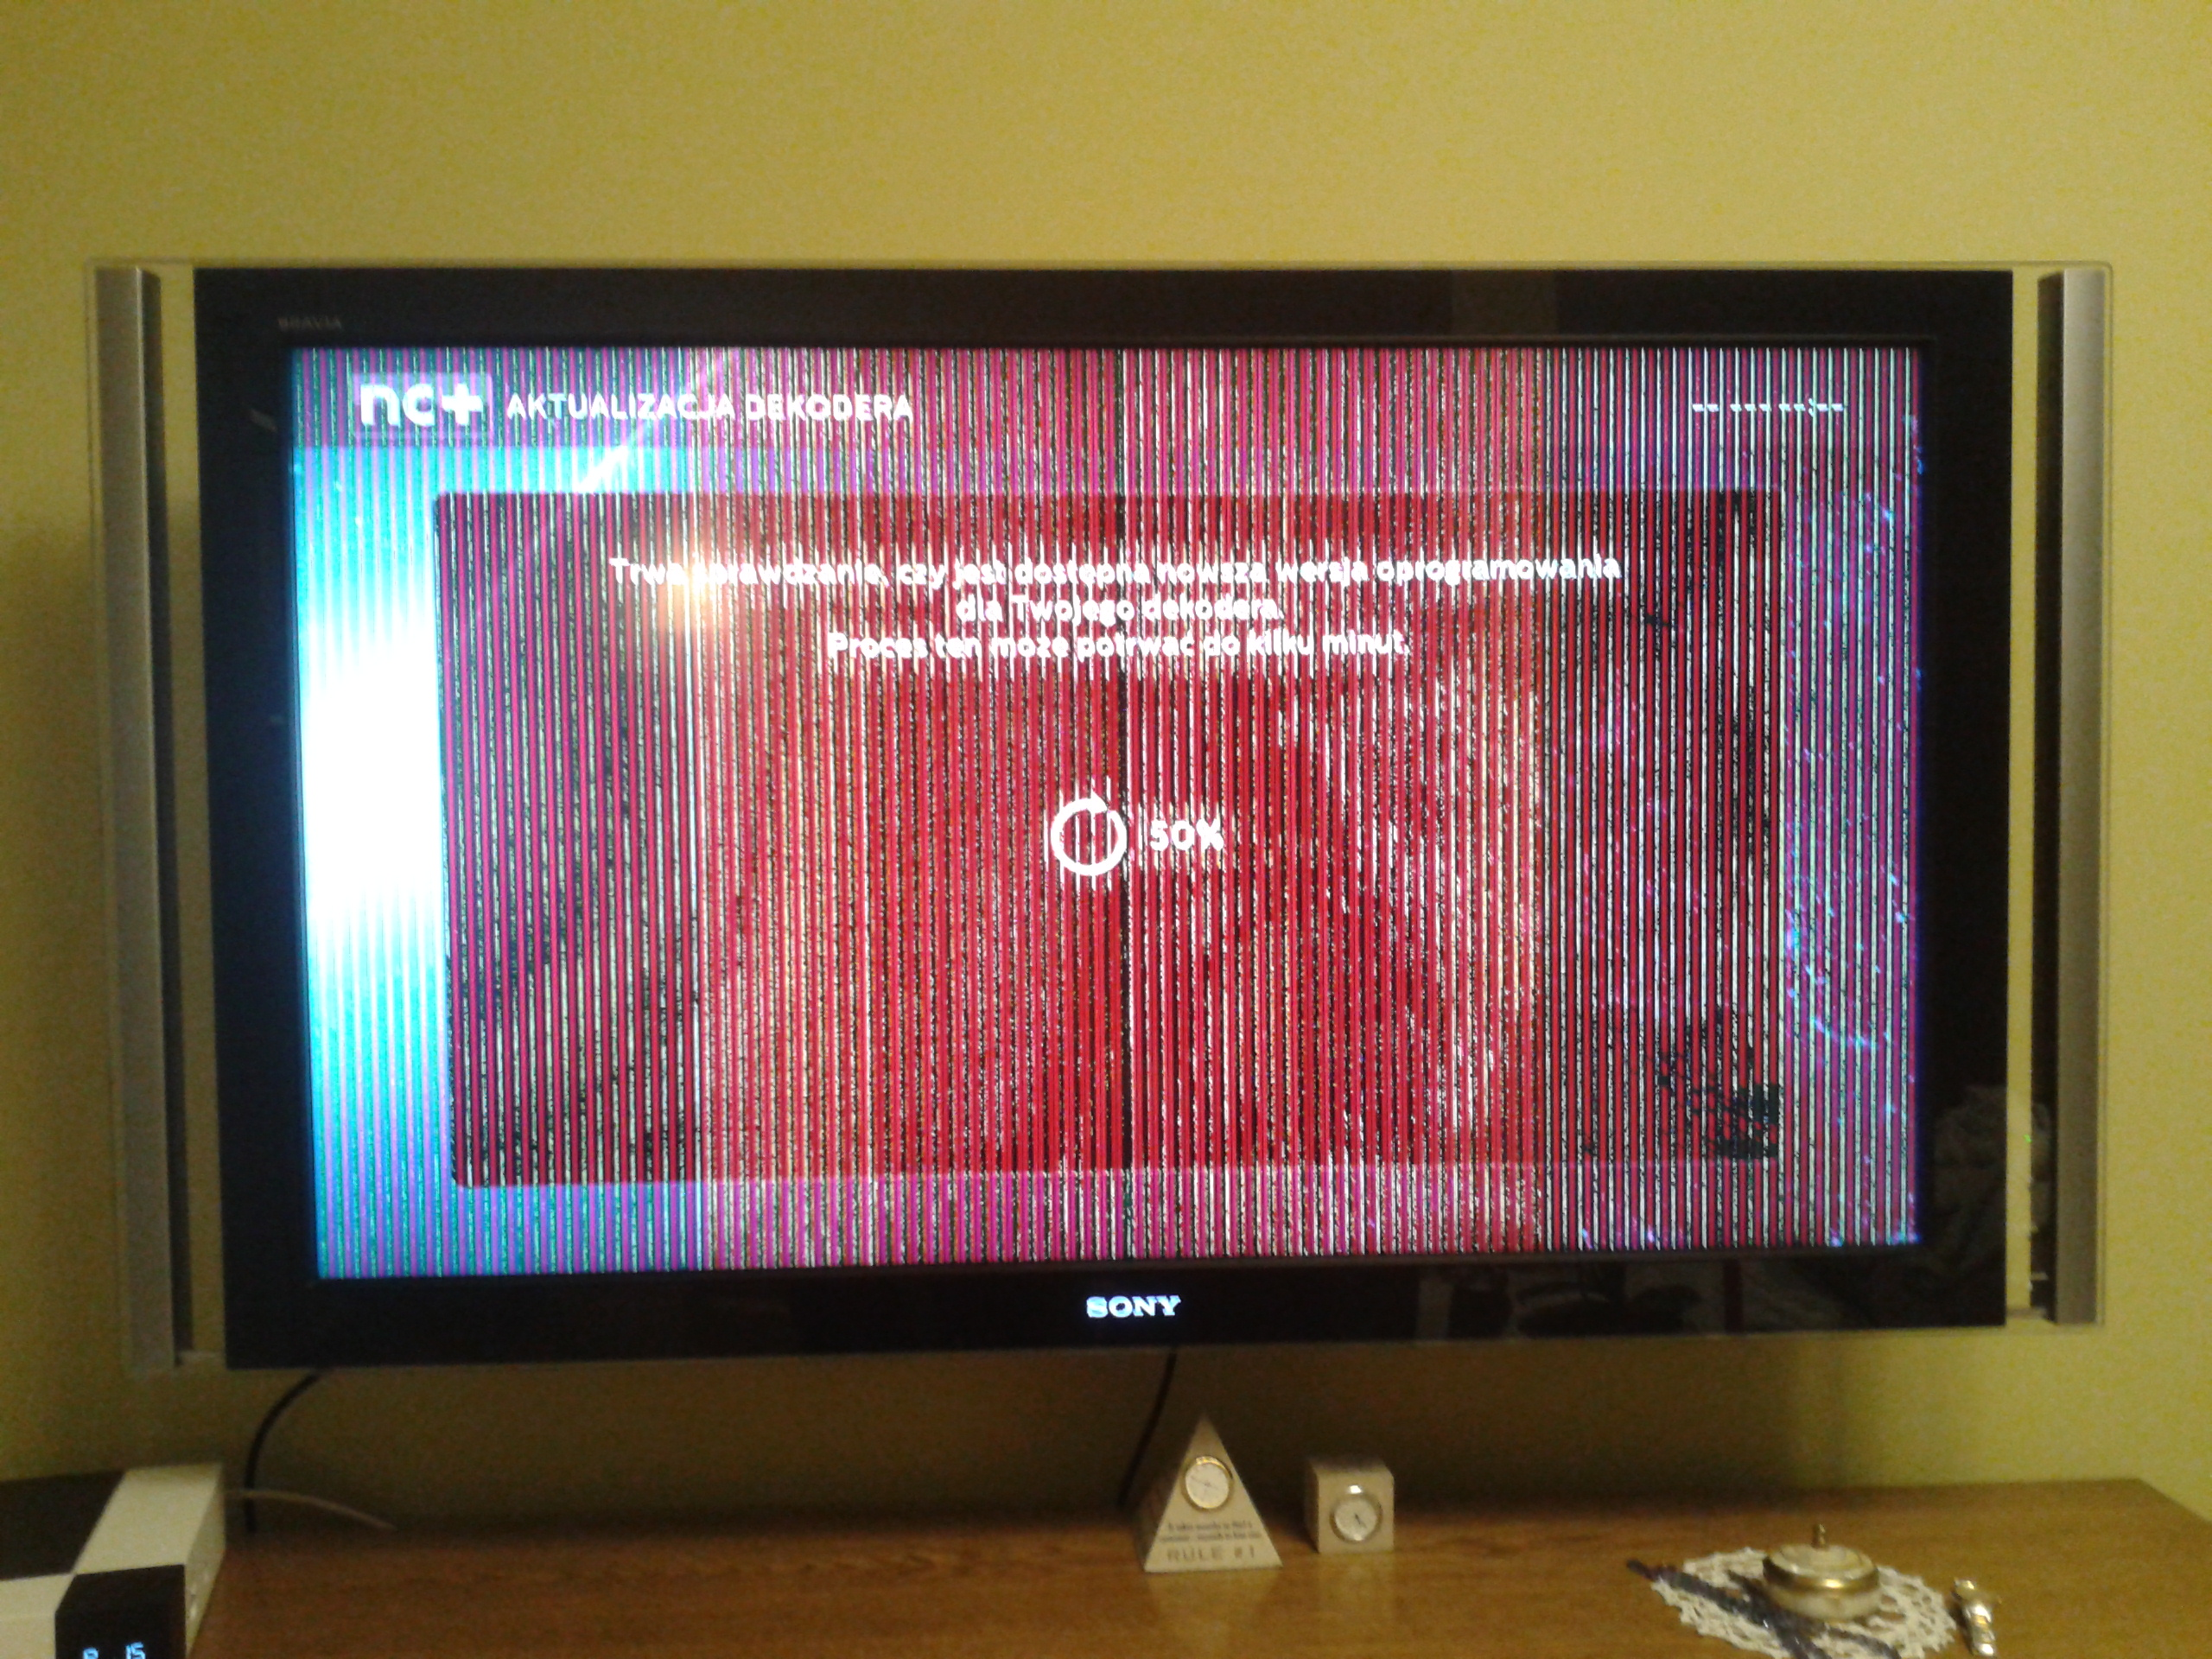 LCD TV Sony Bravia KDL-46X4500AEP - vertical stripes on the screen